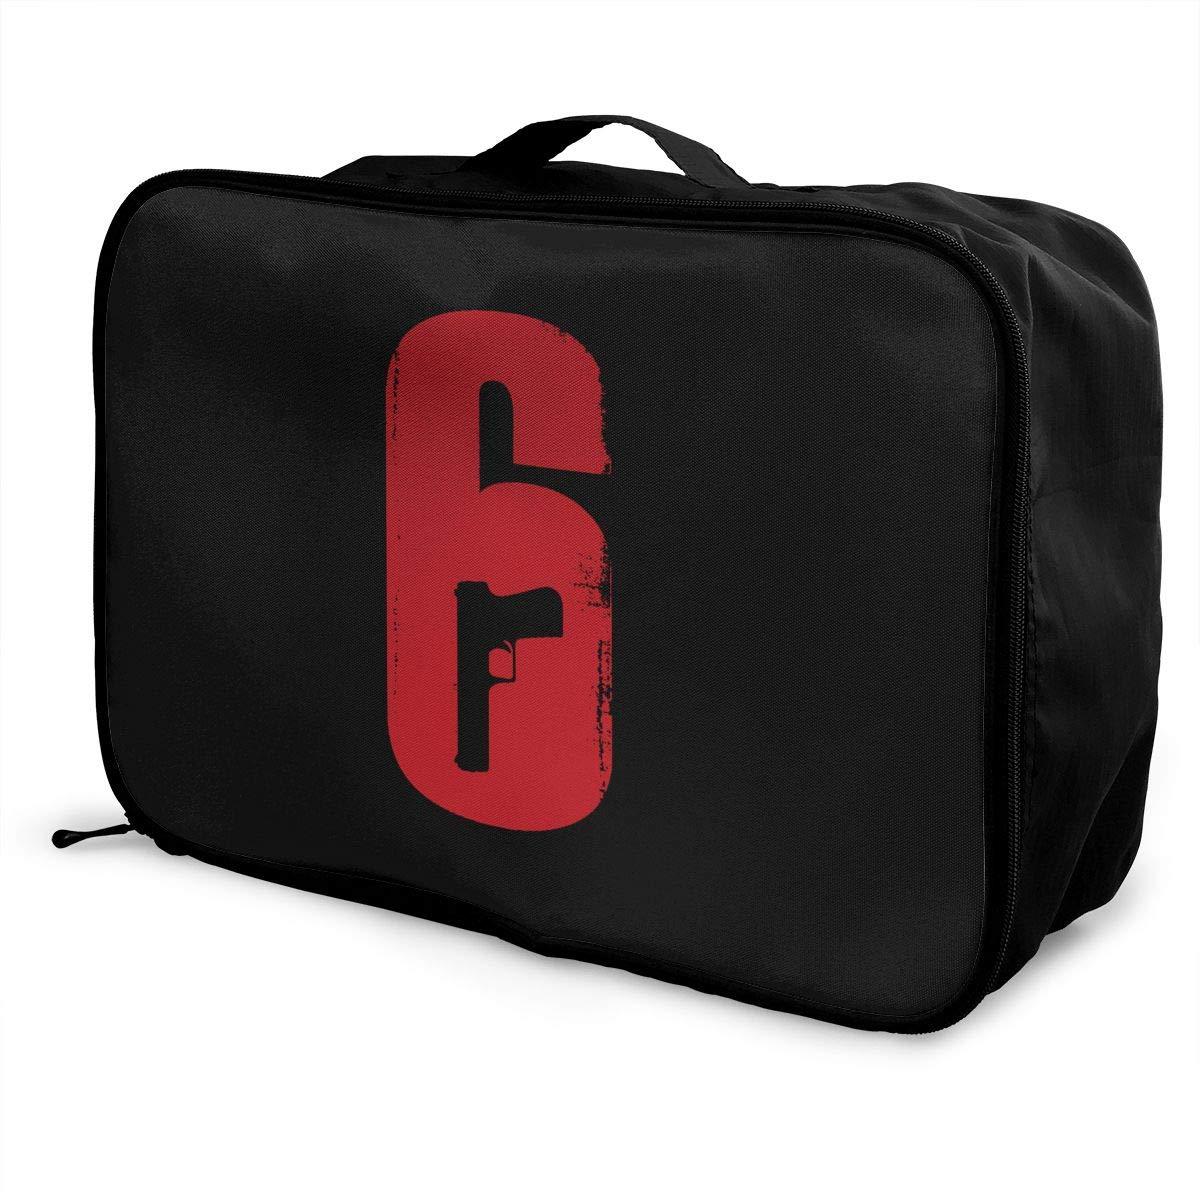 Travel Duffel Bag Waterproof Fashion Lightweight Large Capacity Portable Duffel Bag for Men /& Women JTRVW Luggage Bags for Travel Green Dirt Bike Colorful Patterned